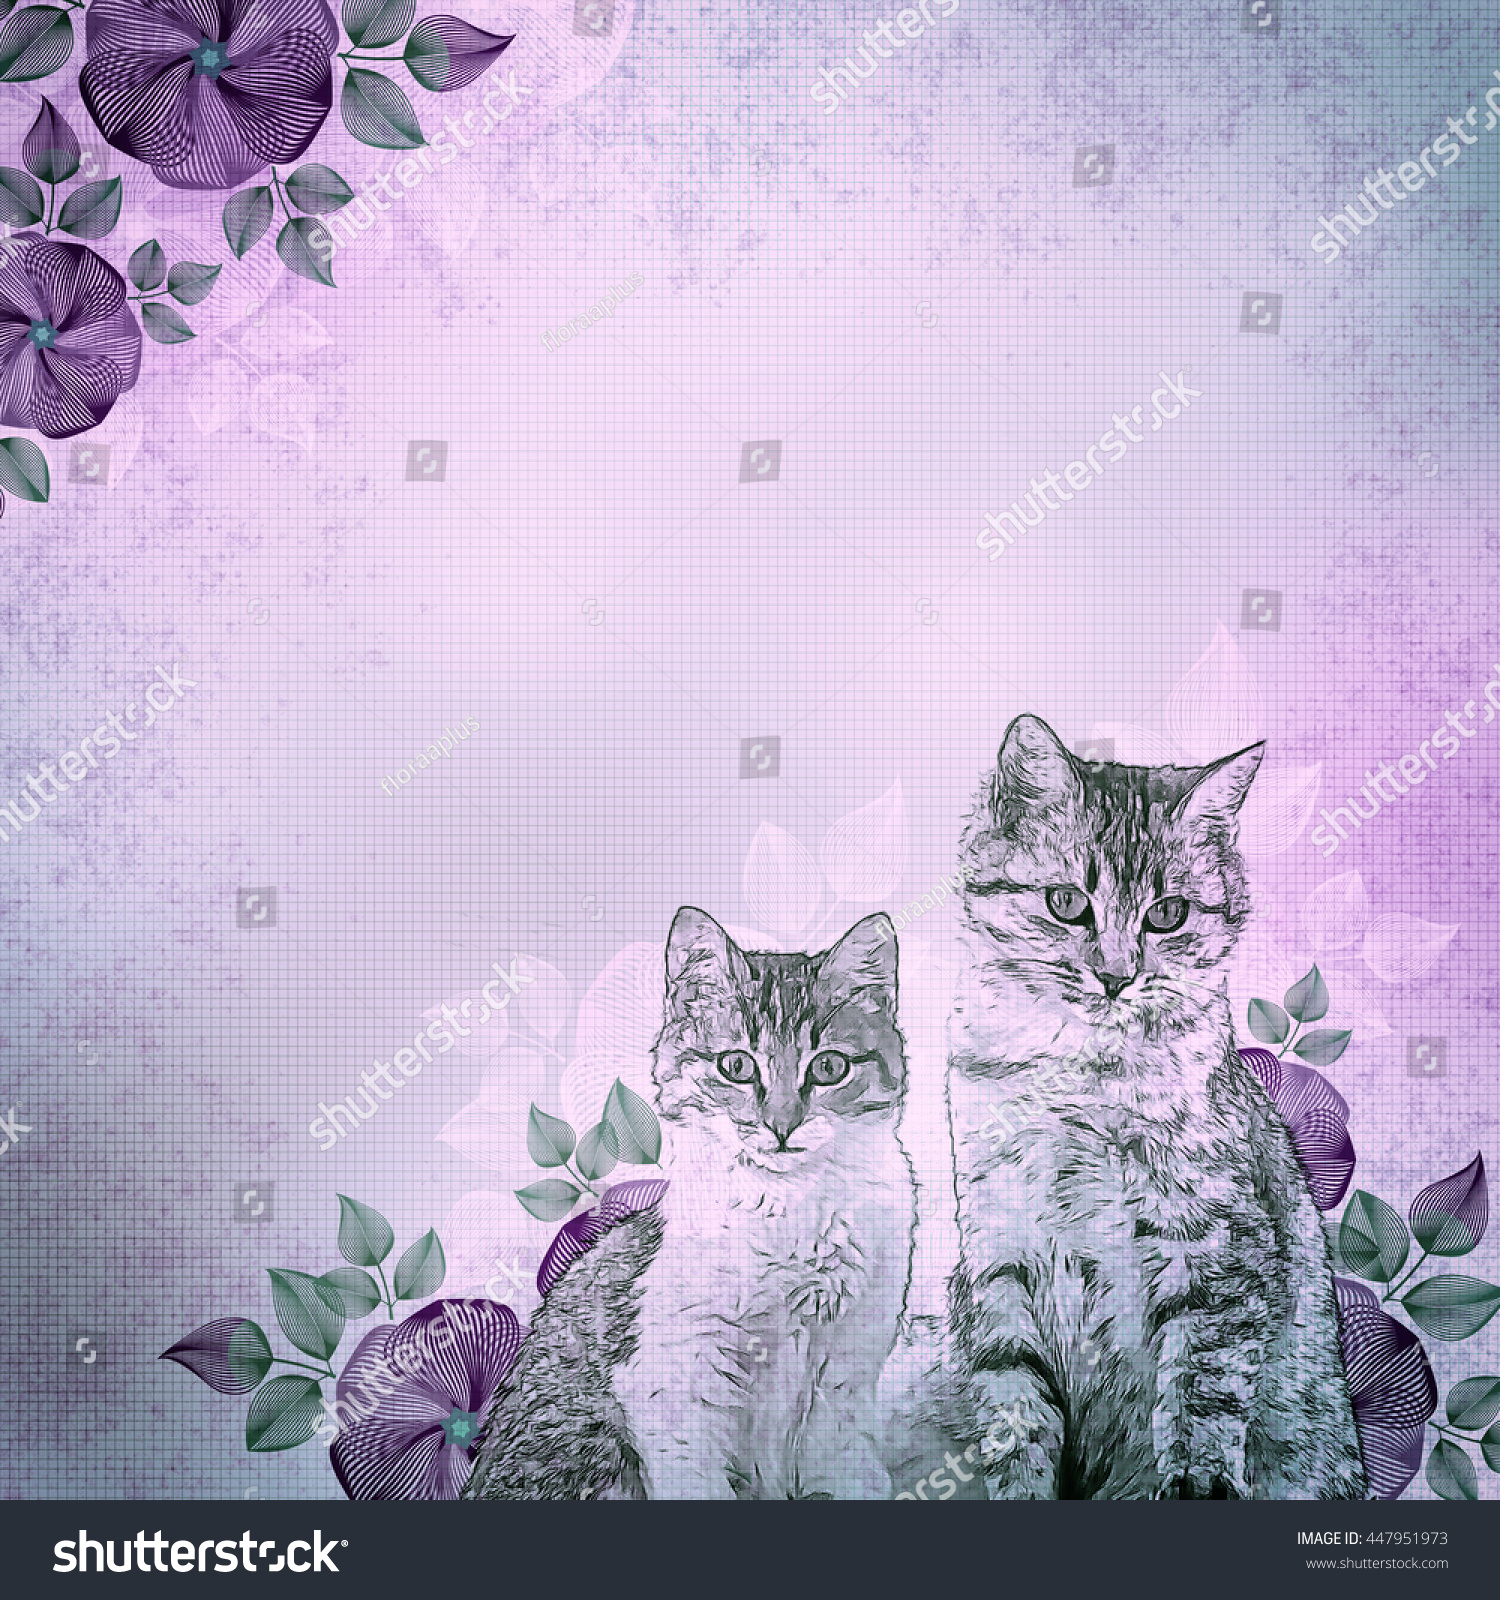 https://image.shutterstock.com/z/stock-photo-ancient-illustration-kittens-and-flowers-violet-vintage-background-basis-for-design-447951973.jpg